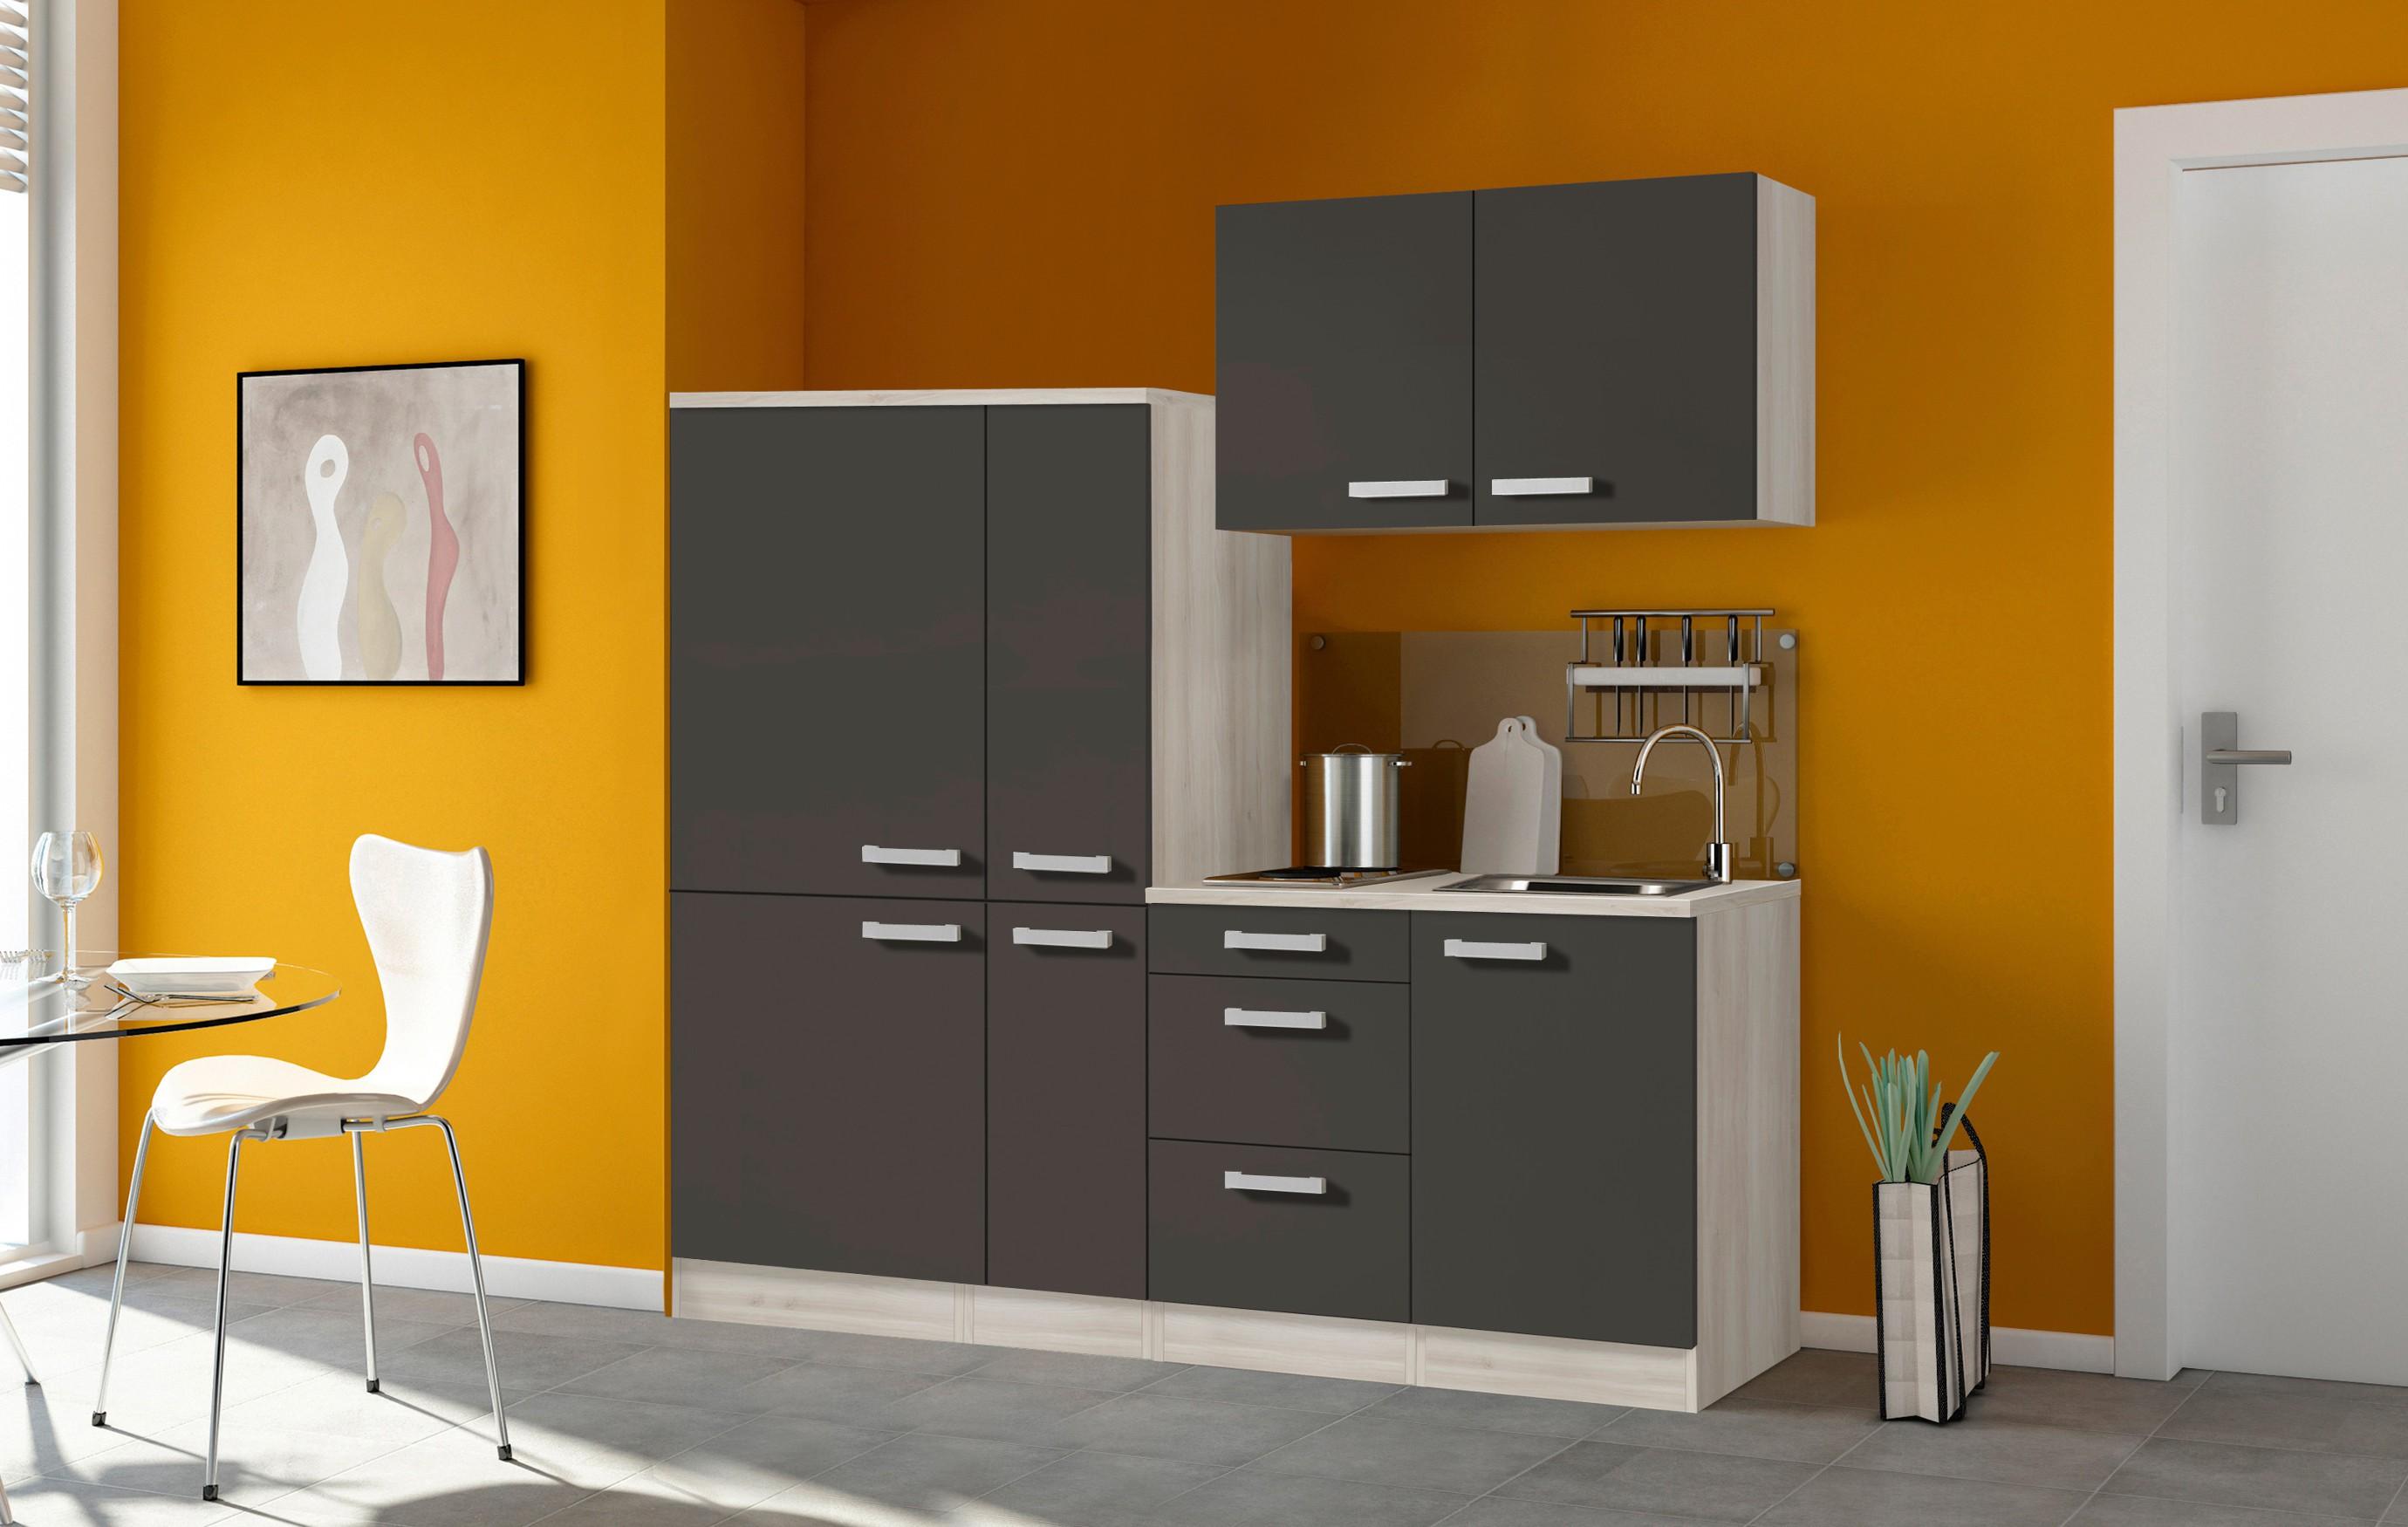 Miniküche Mit Kühlschrank 90 Cm : Singleküche barcelona mit elektro kochfeld breite cm